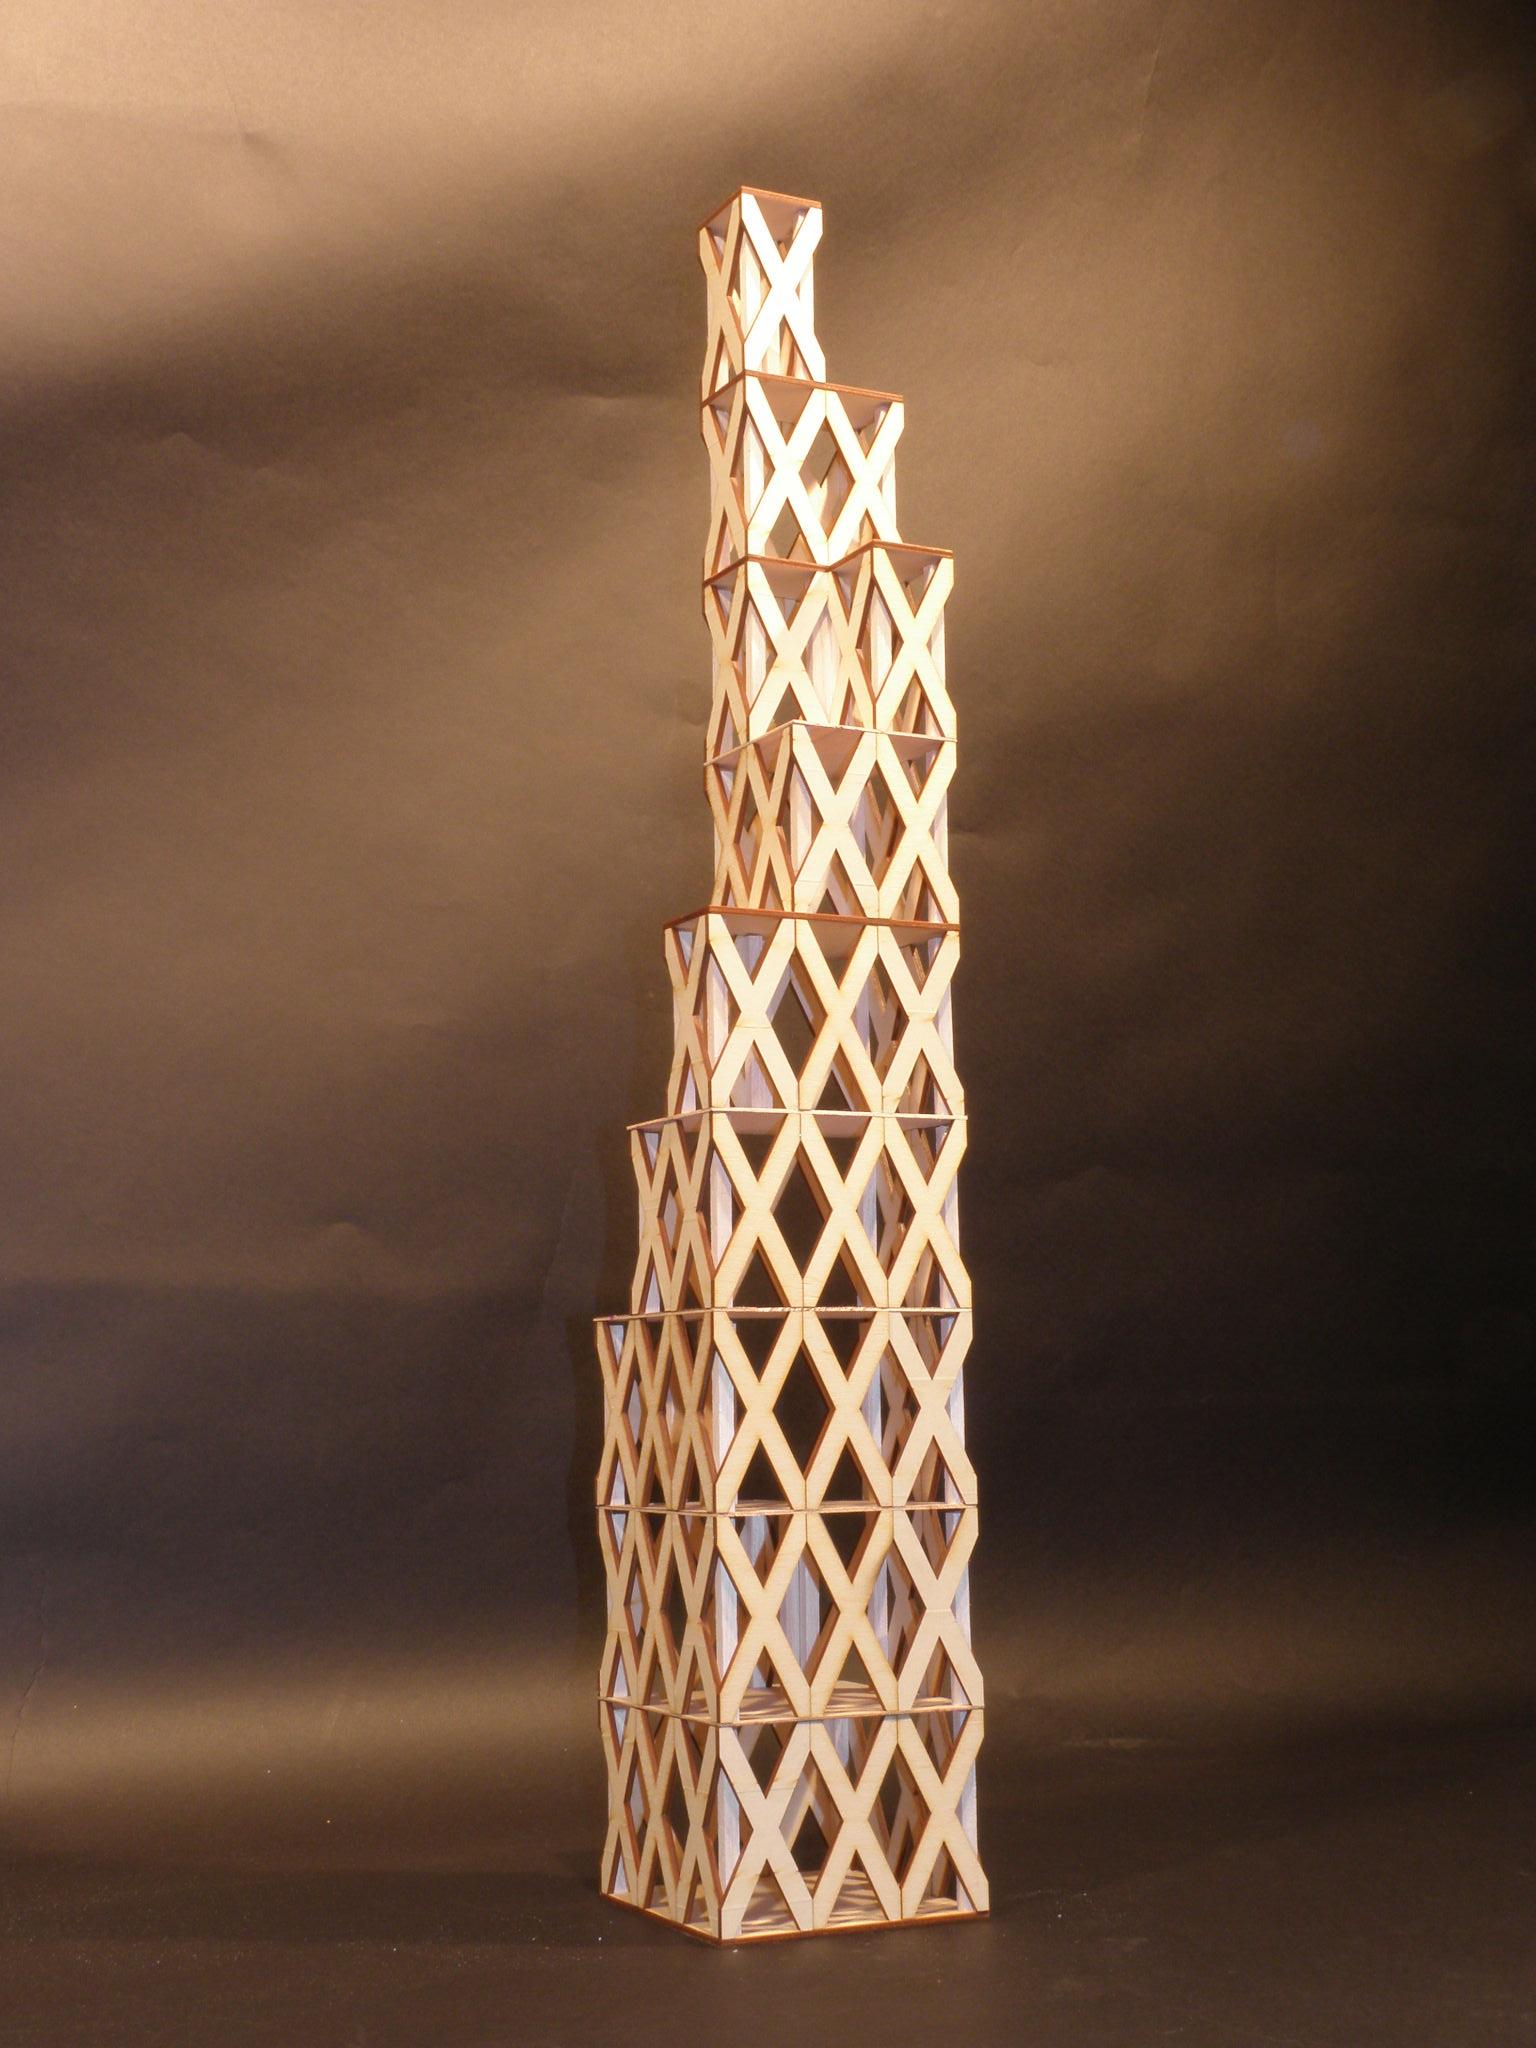 Download Balsa Wood Tower Plans Plans Free Bathroom Storage Cabinets